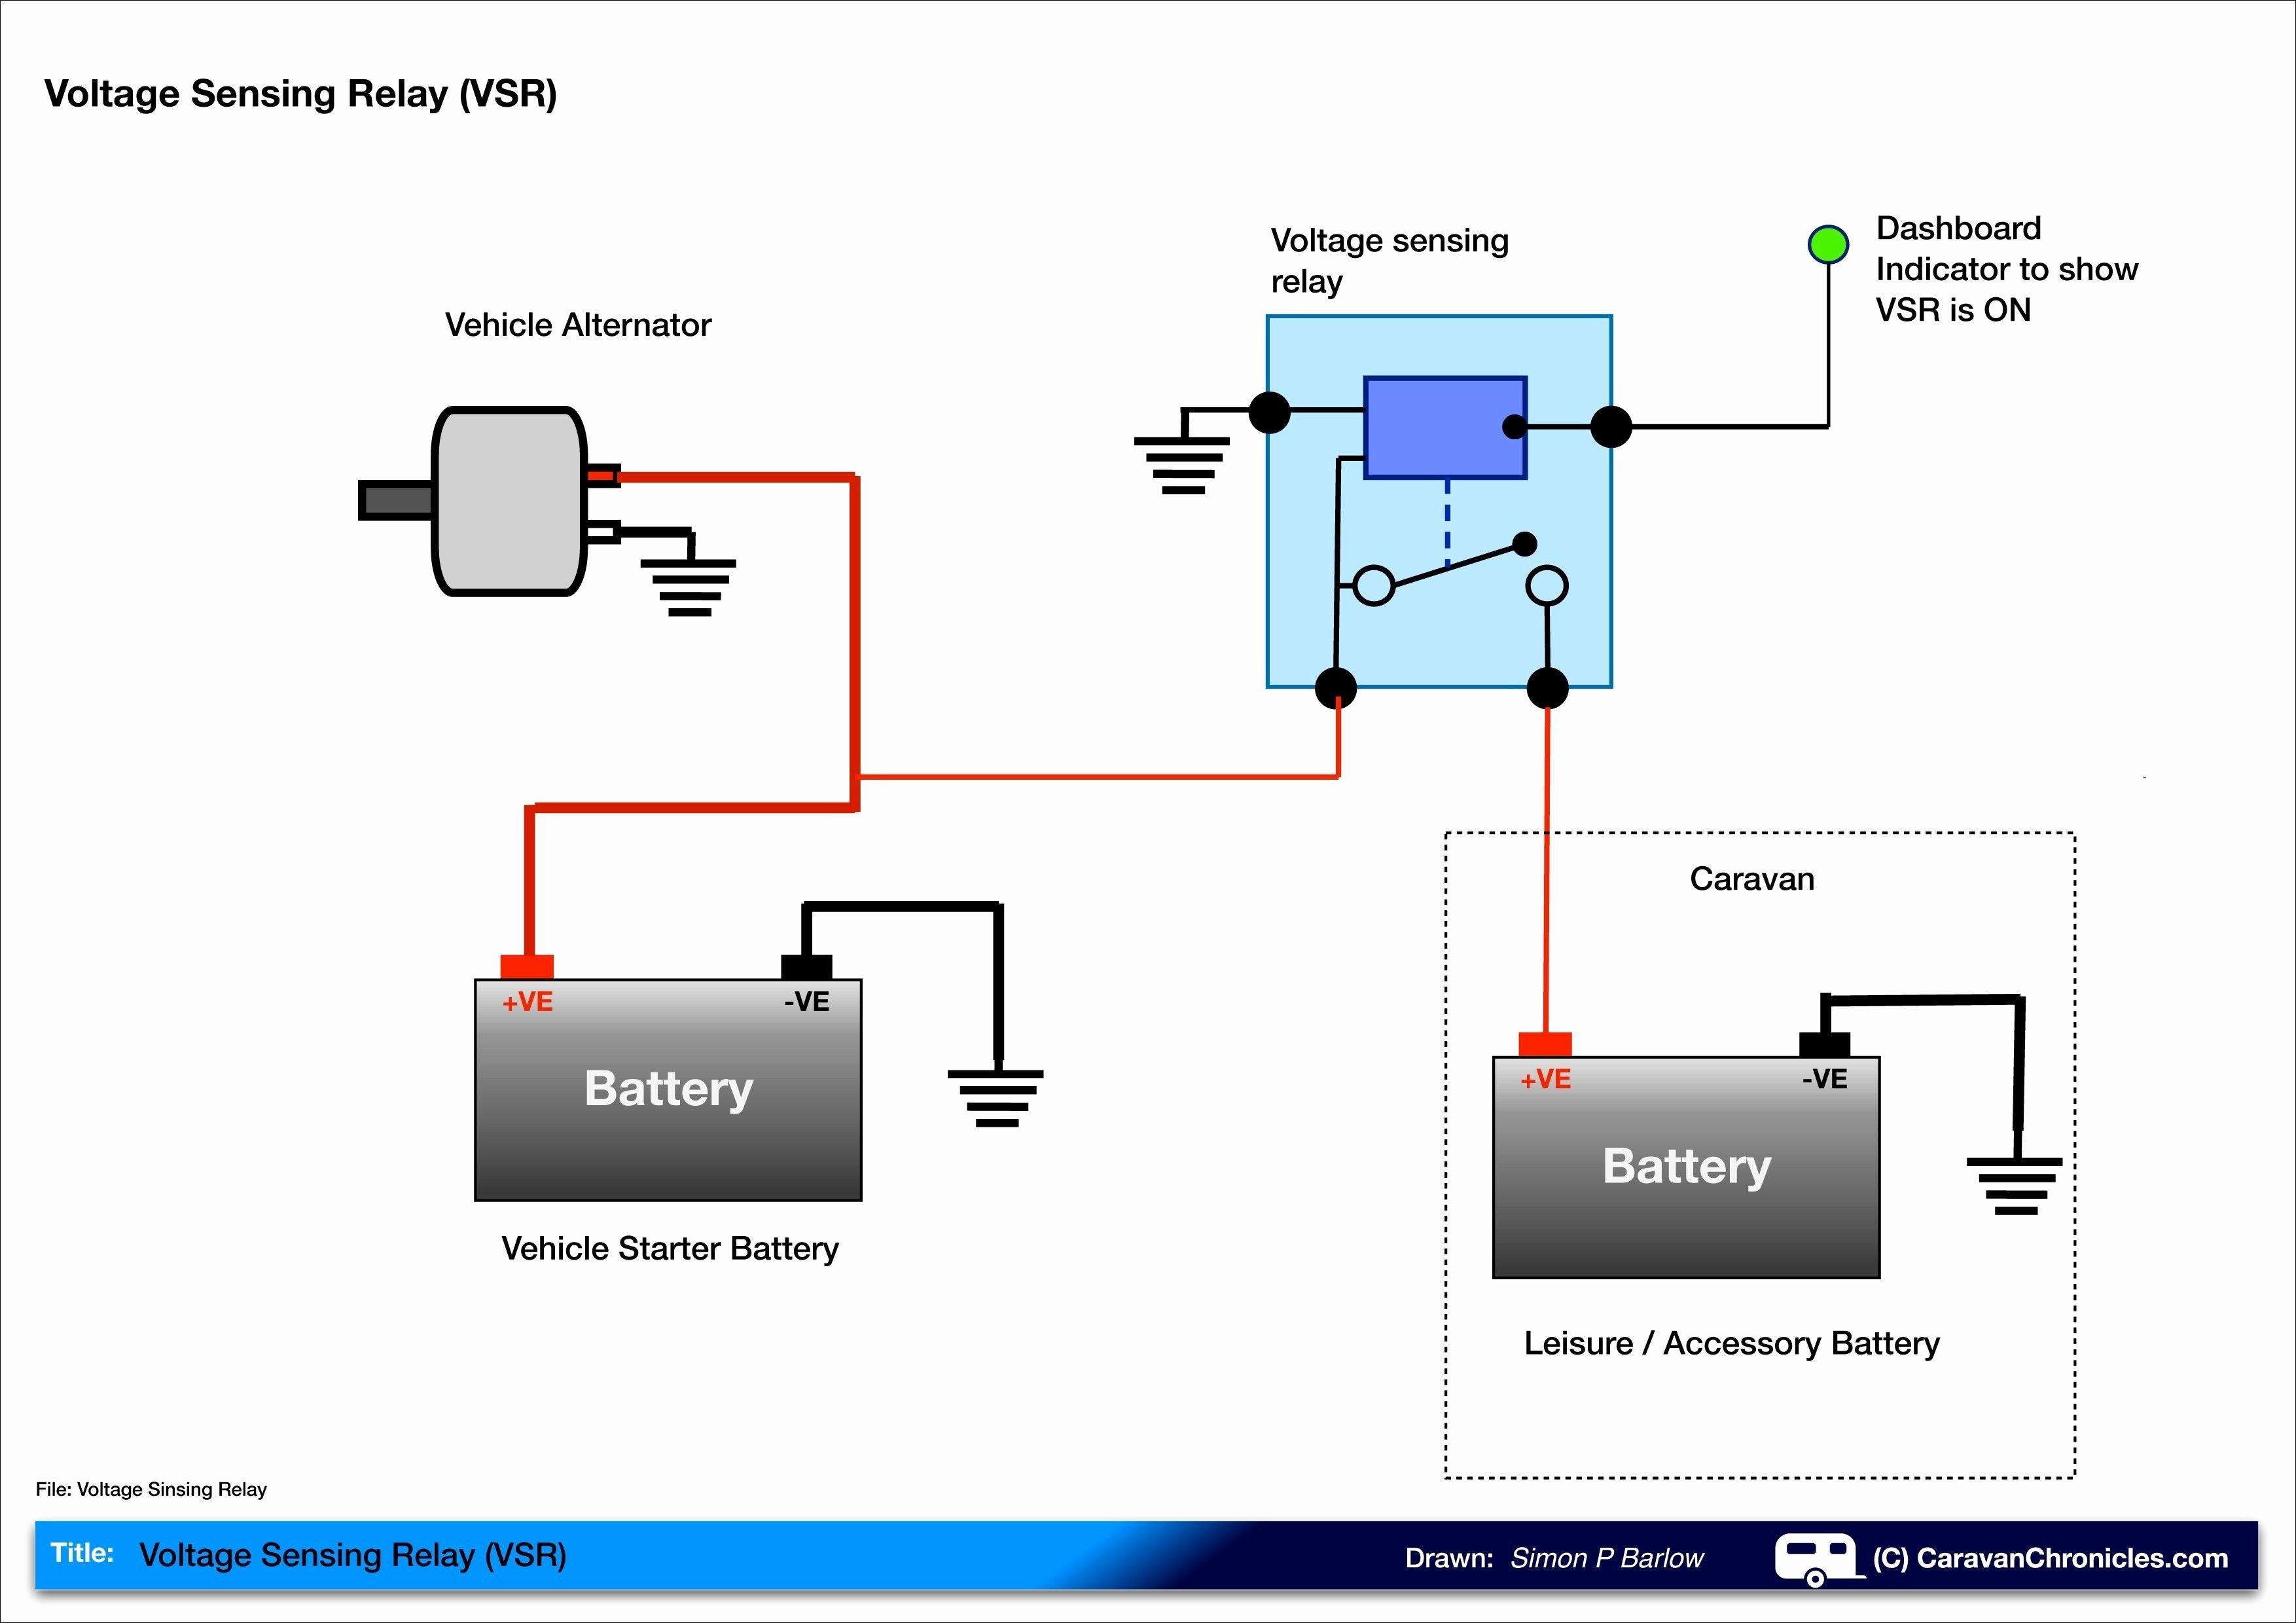 4 Pole Starter solenoid Wiring Diagram New Fresh 4 Pin Relay Wiring | Boat  battery, Solar panels, Solar charger | Ford Tractor Solenoid Wiring Diagram 4 Prong |  | Pinterest